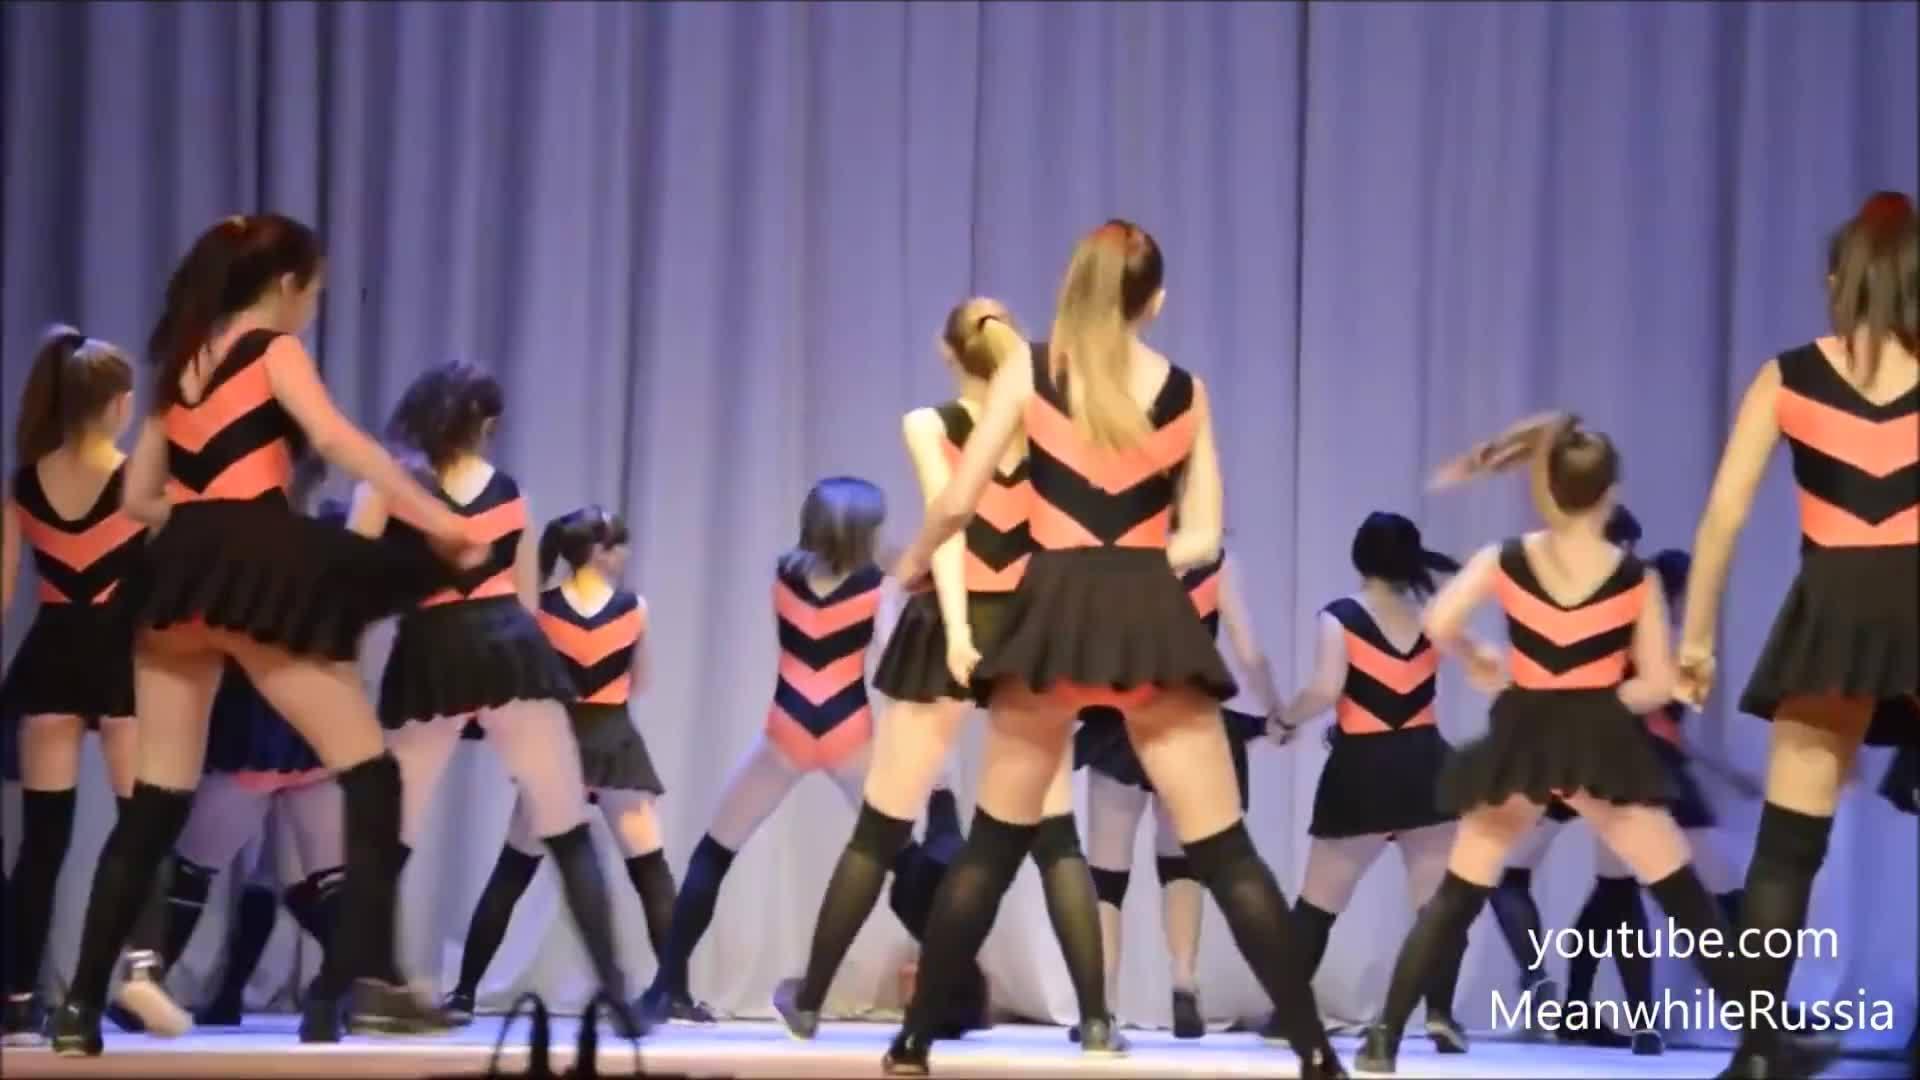 Russian Girls Twerking In Winnie The Pooh Gif Find Make Share Gfycat Gifs